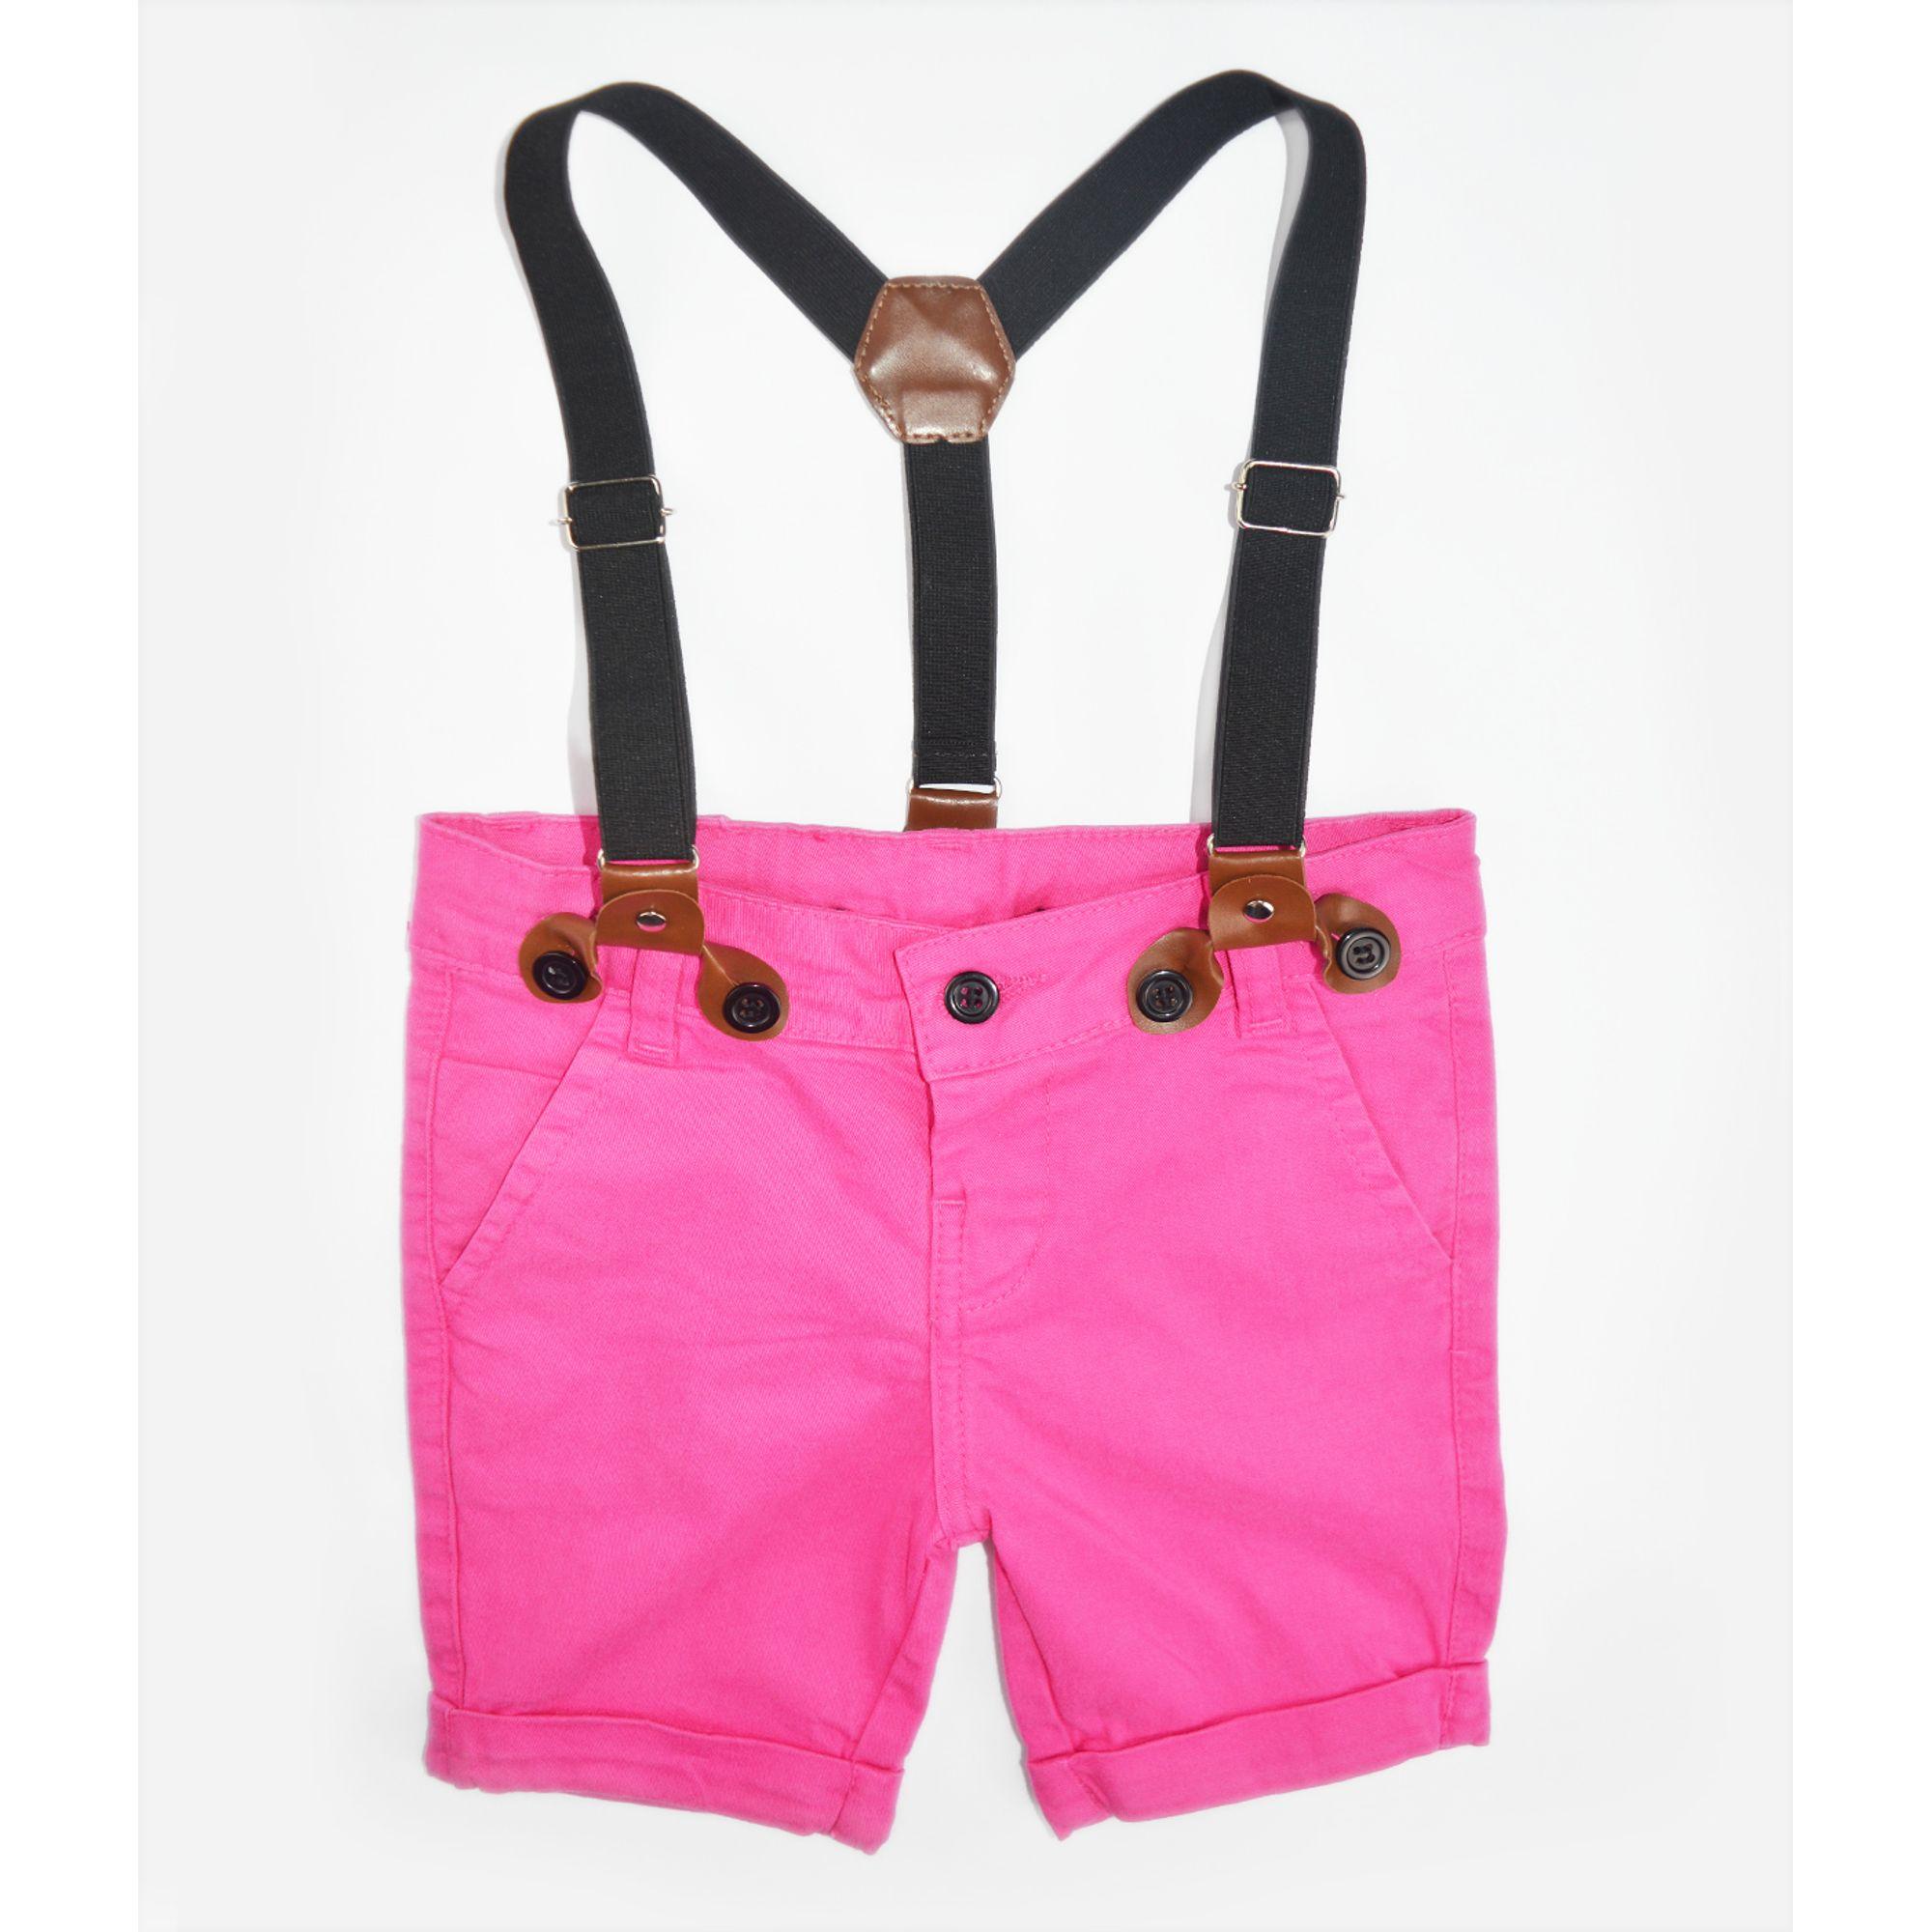 bermuda-menina-com-suspensorio-pink-cool-girlz